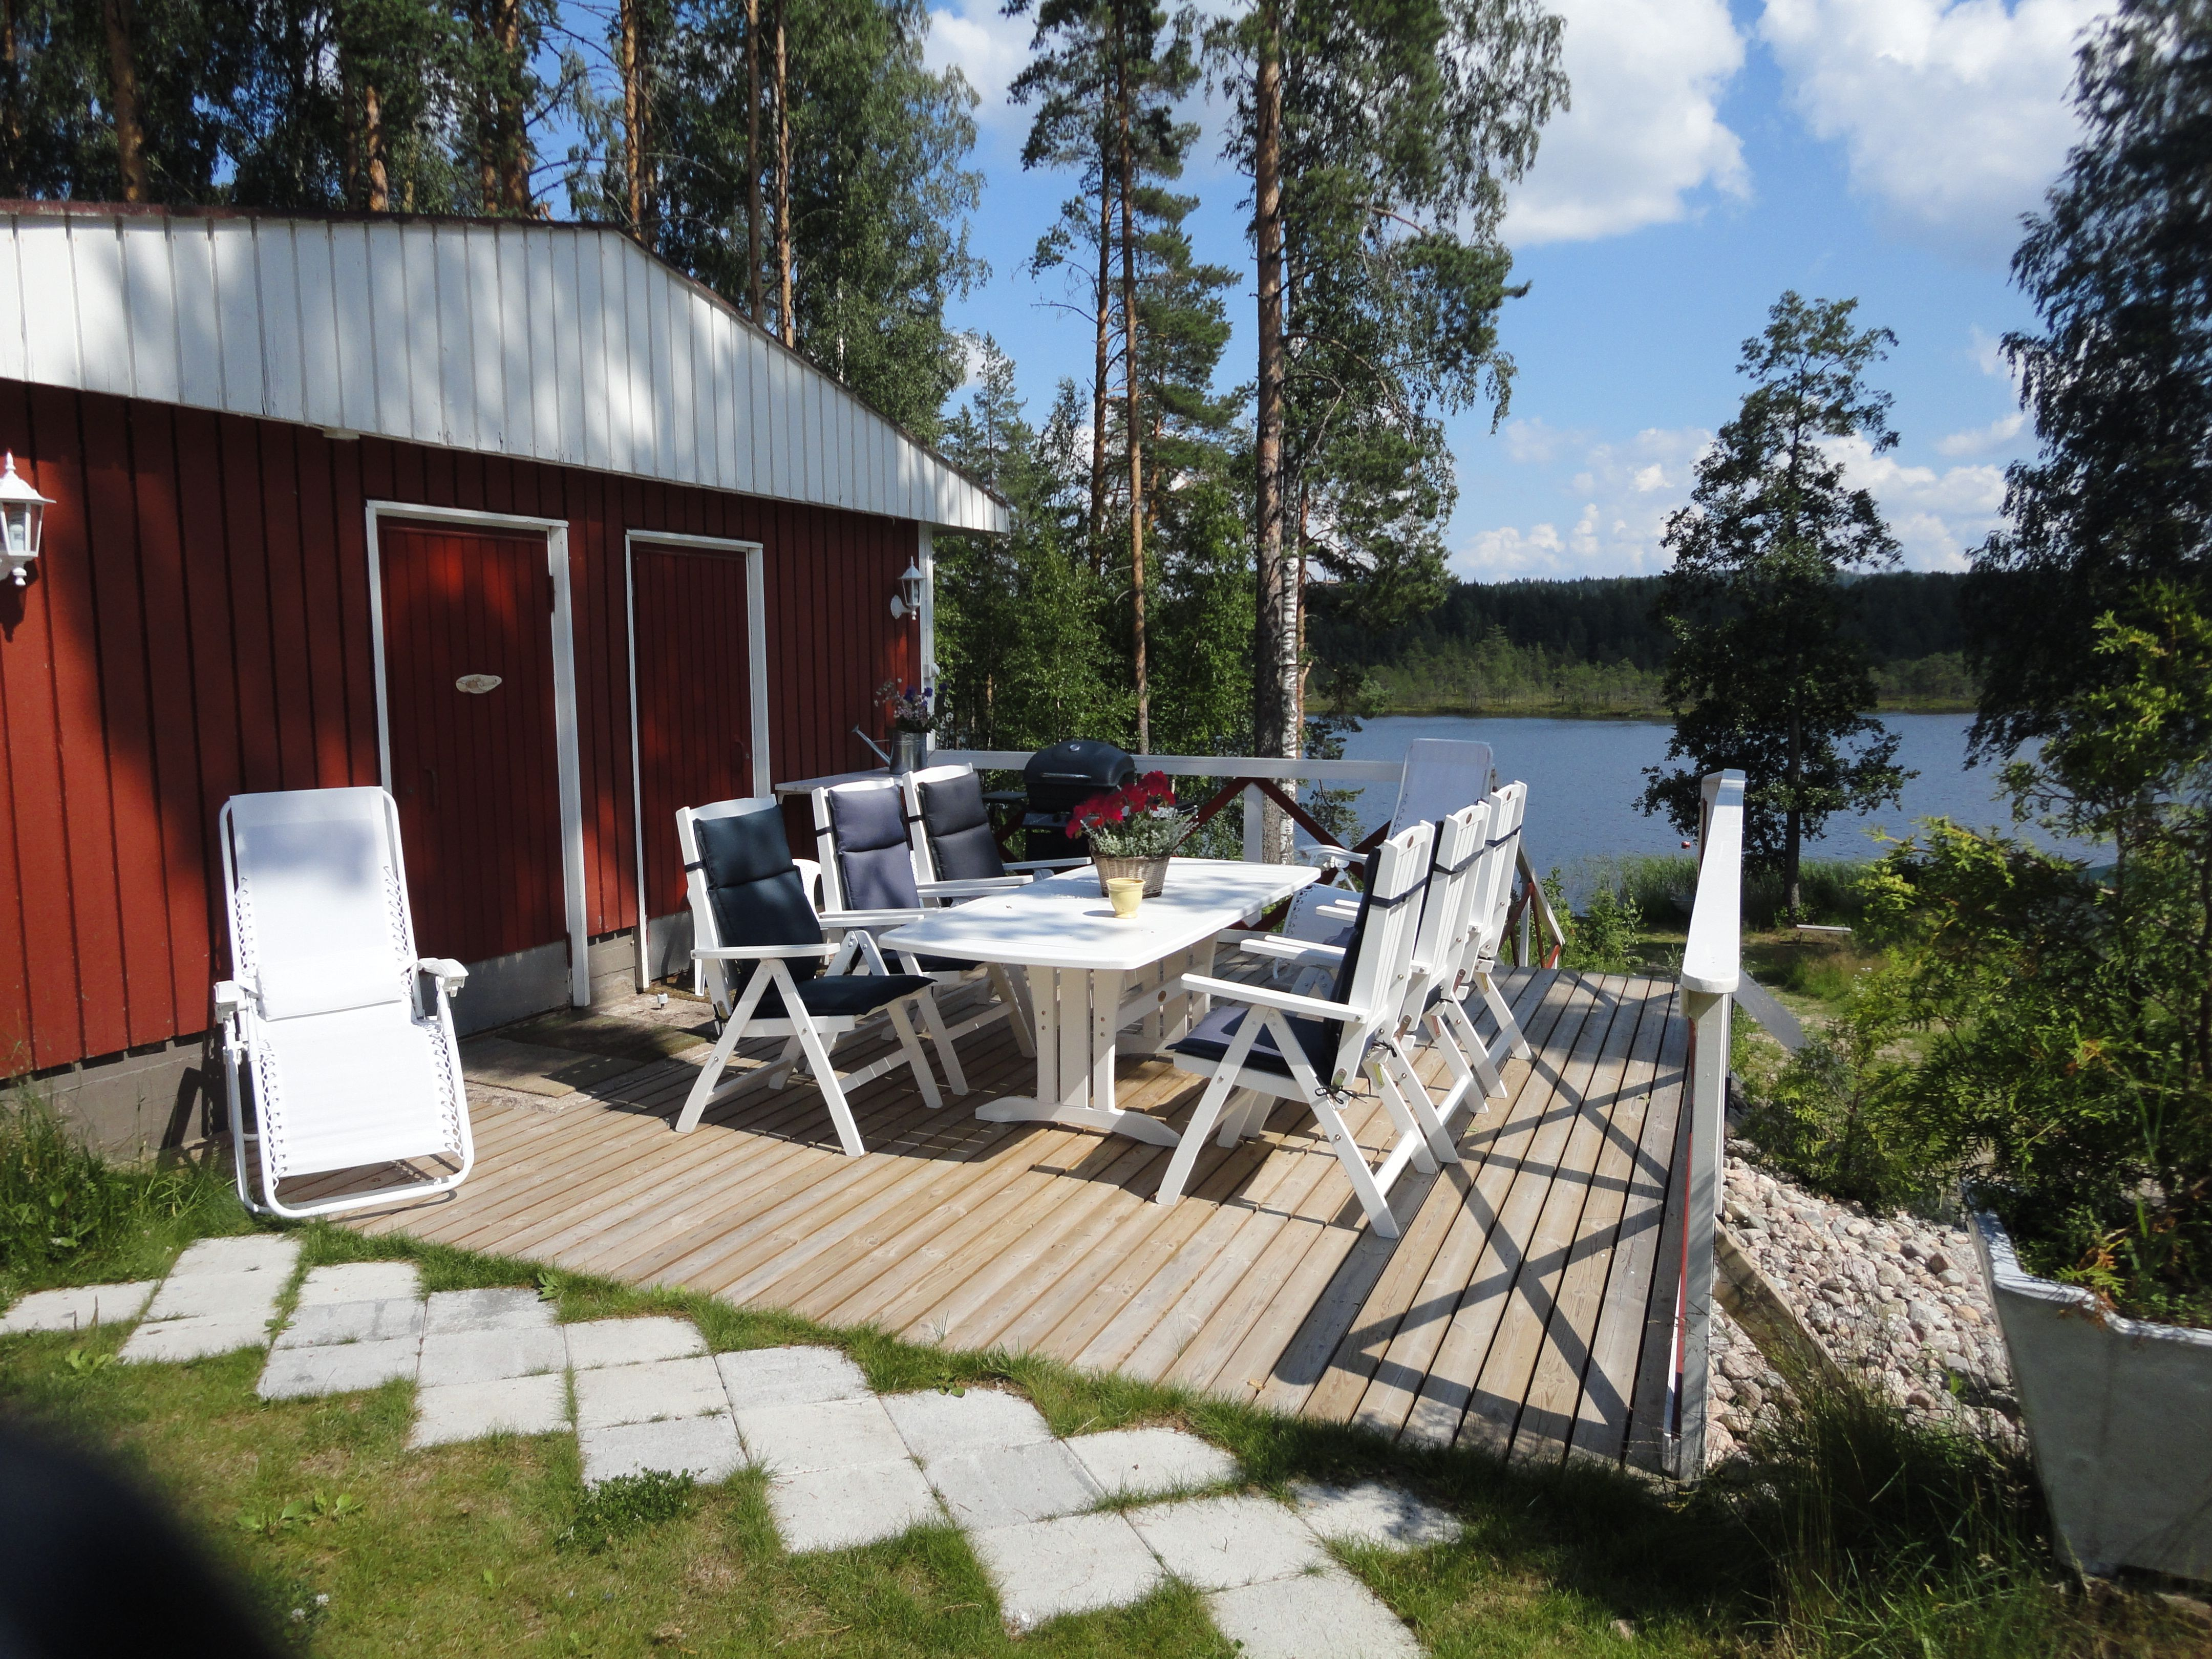 Juhla- ja Kokouspalvelu Kaislanranta http://www.kaislanranta.fi/  http://www.facebook.com/MatkaMaalle http://www.keskisuomi.net/ http://www.centralfinland.net/